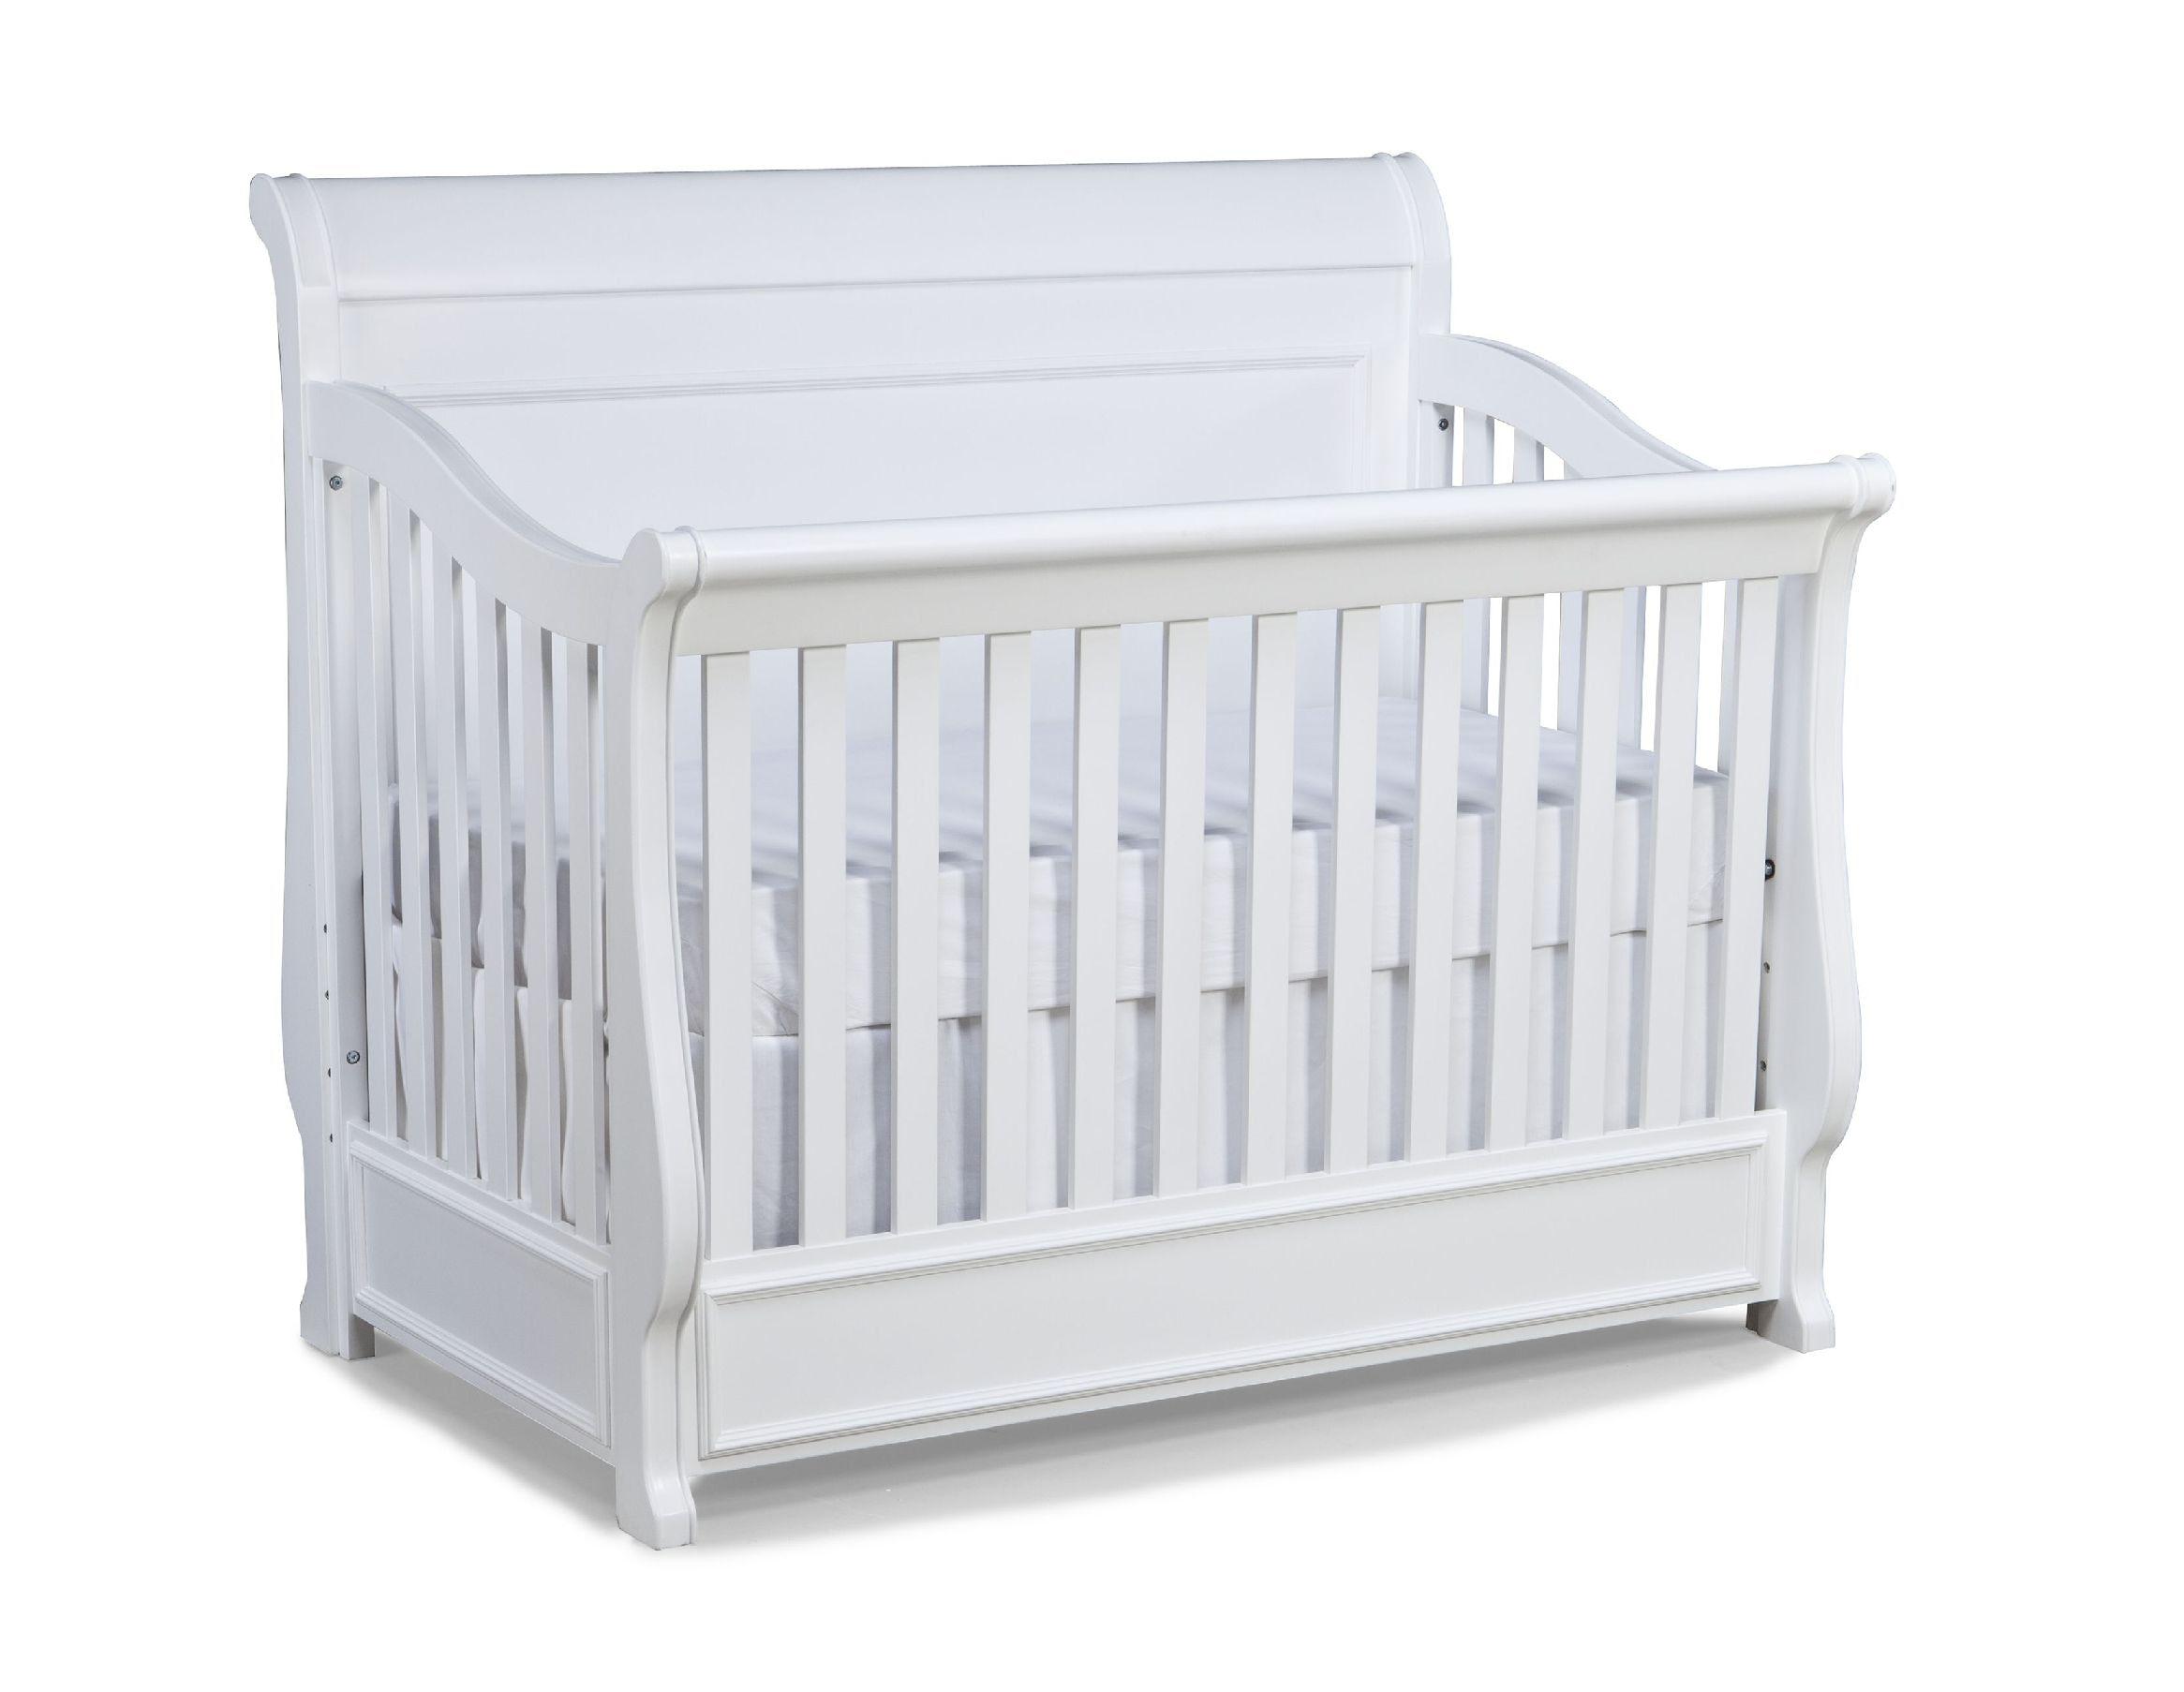 Legacy Classic Kids Nursery Convertible Crib 2830 8900